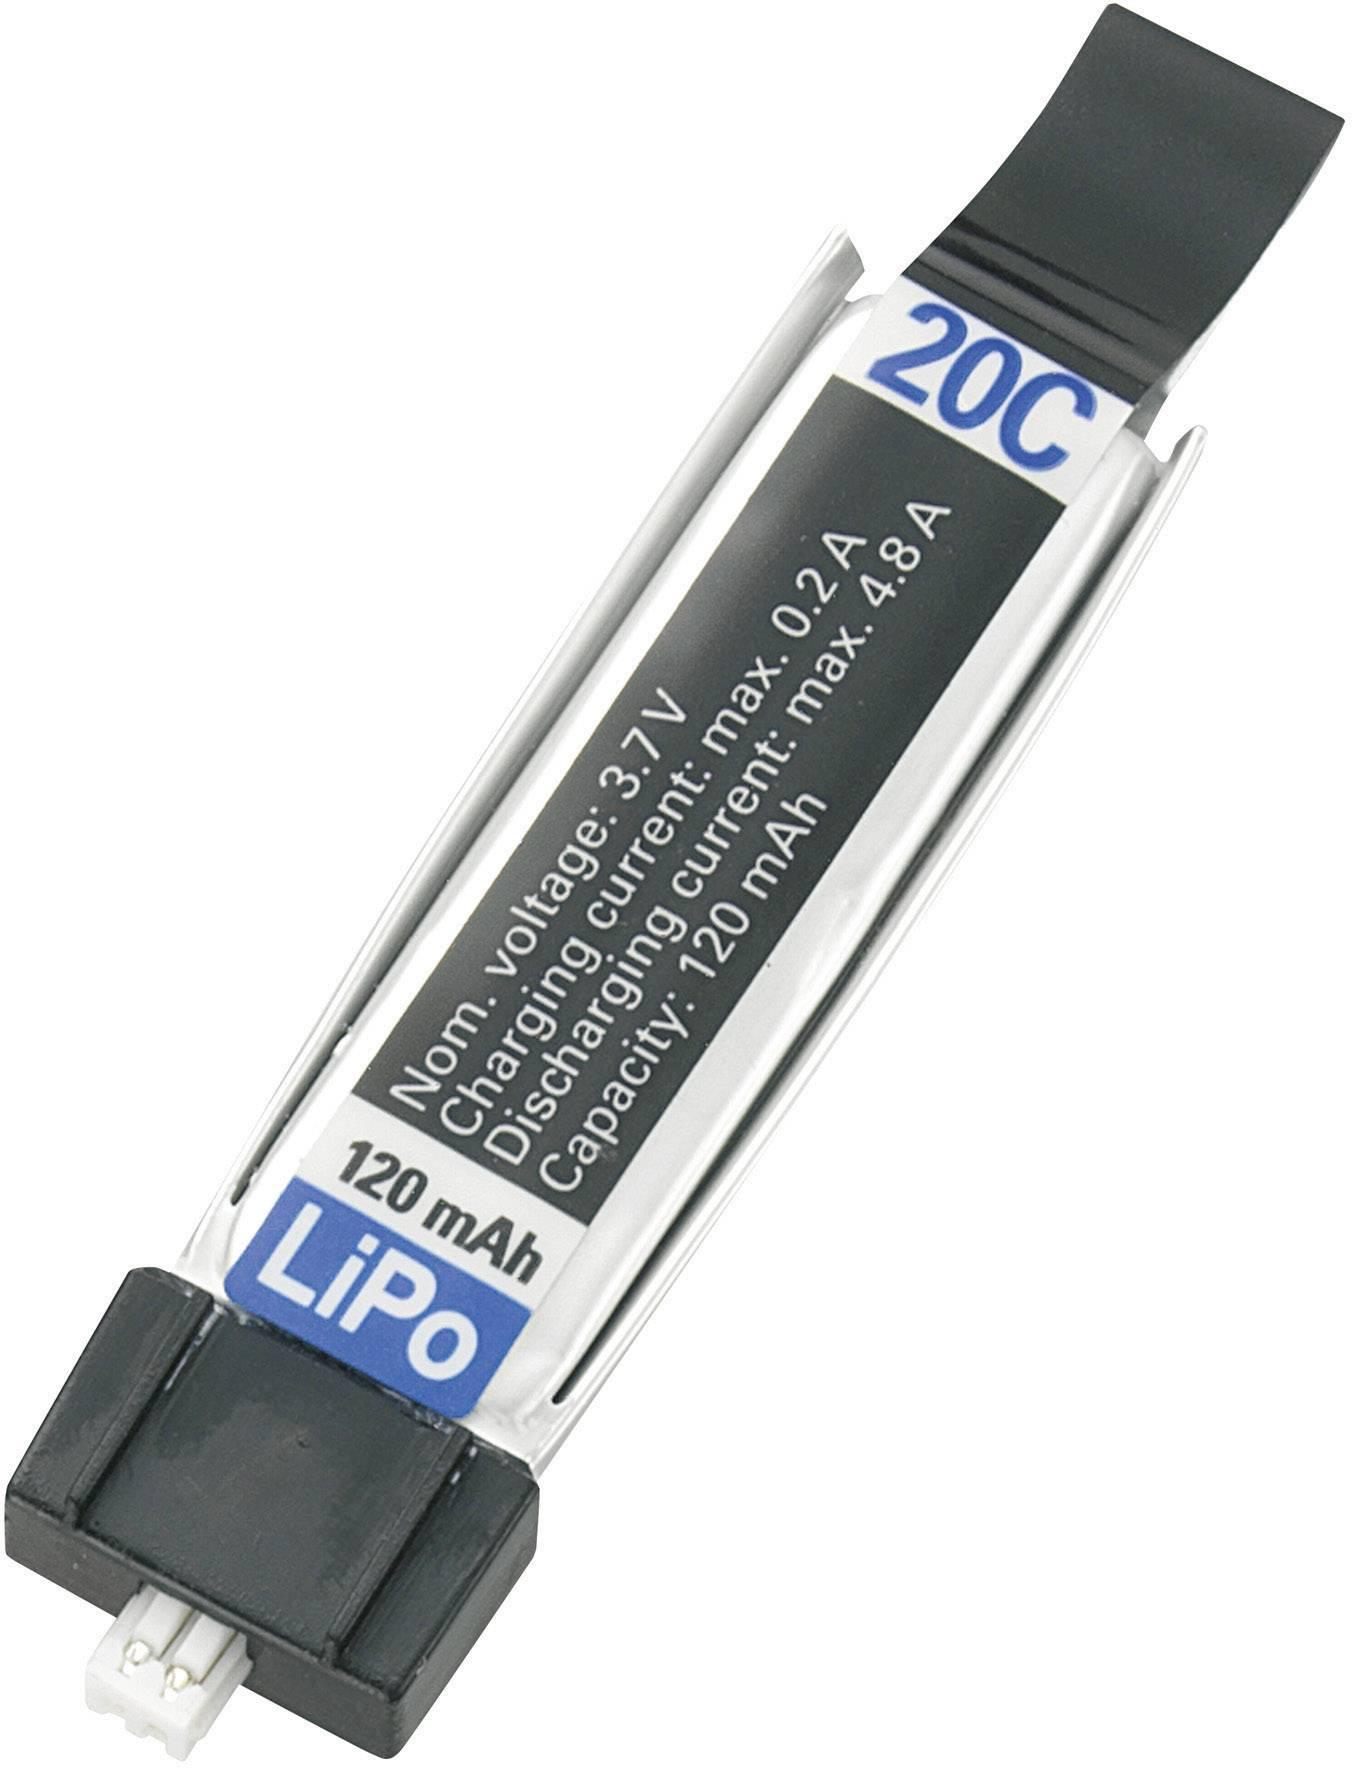 Akupack Li-Pol Conrad energy 467c54, 3.7 V, 120 mAh